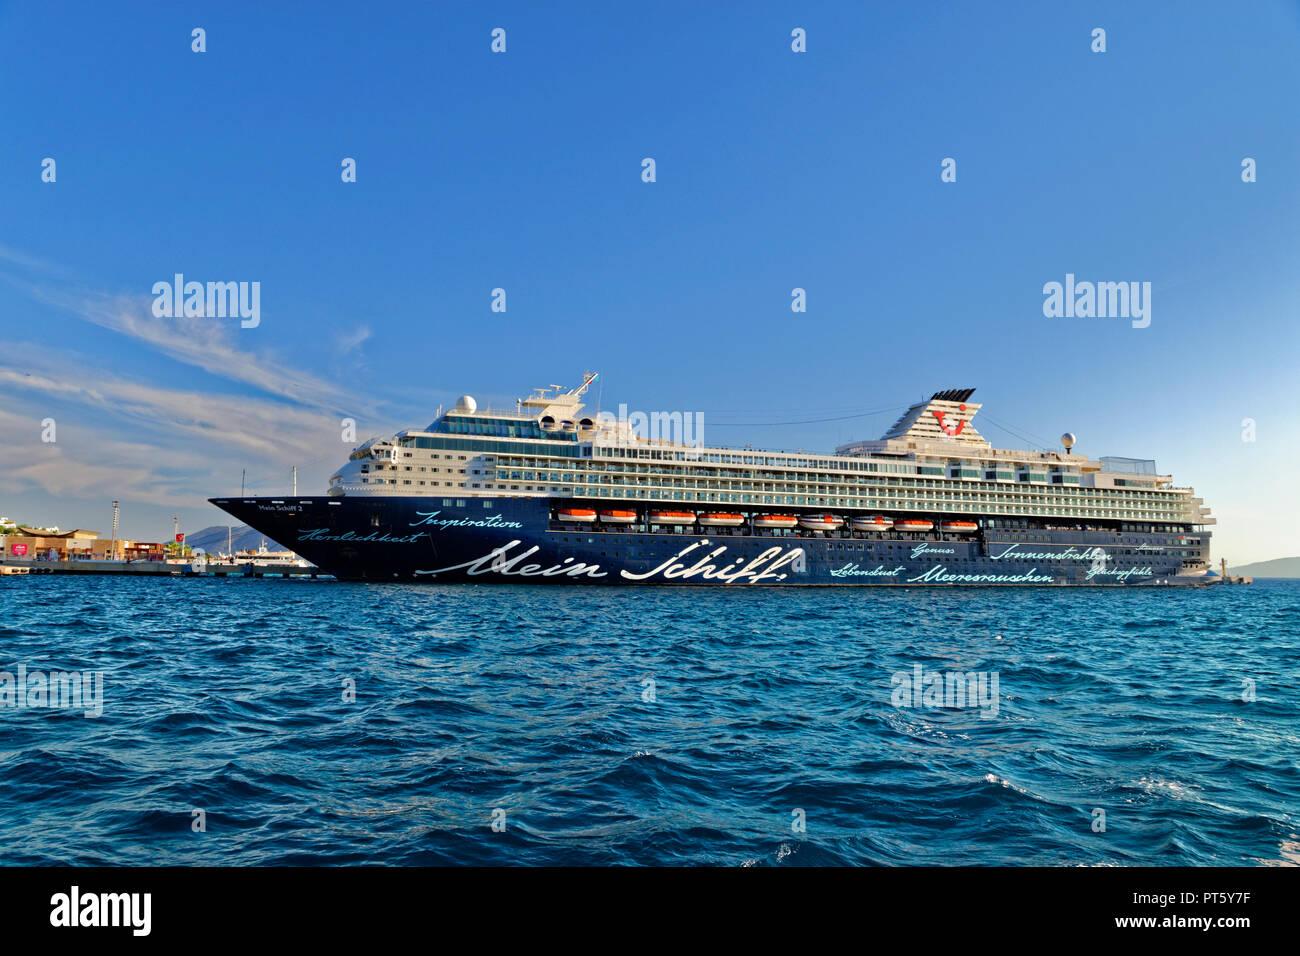 Tui cruise ship 'Mein Schiff 2' docked at Bodrum in Turkey. - Stock Image